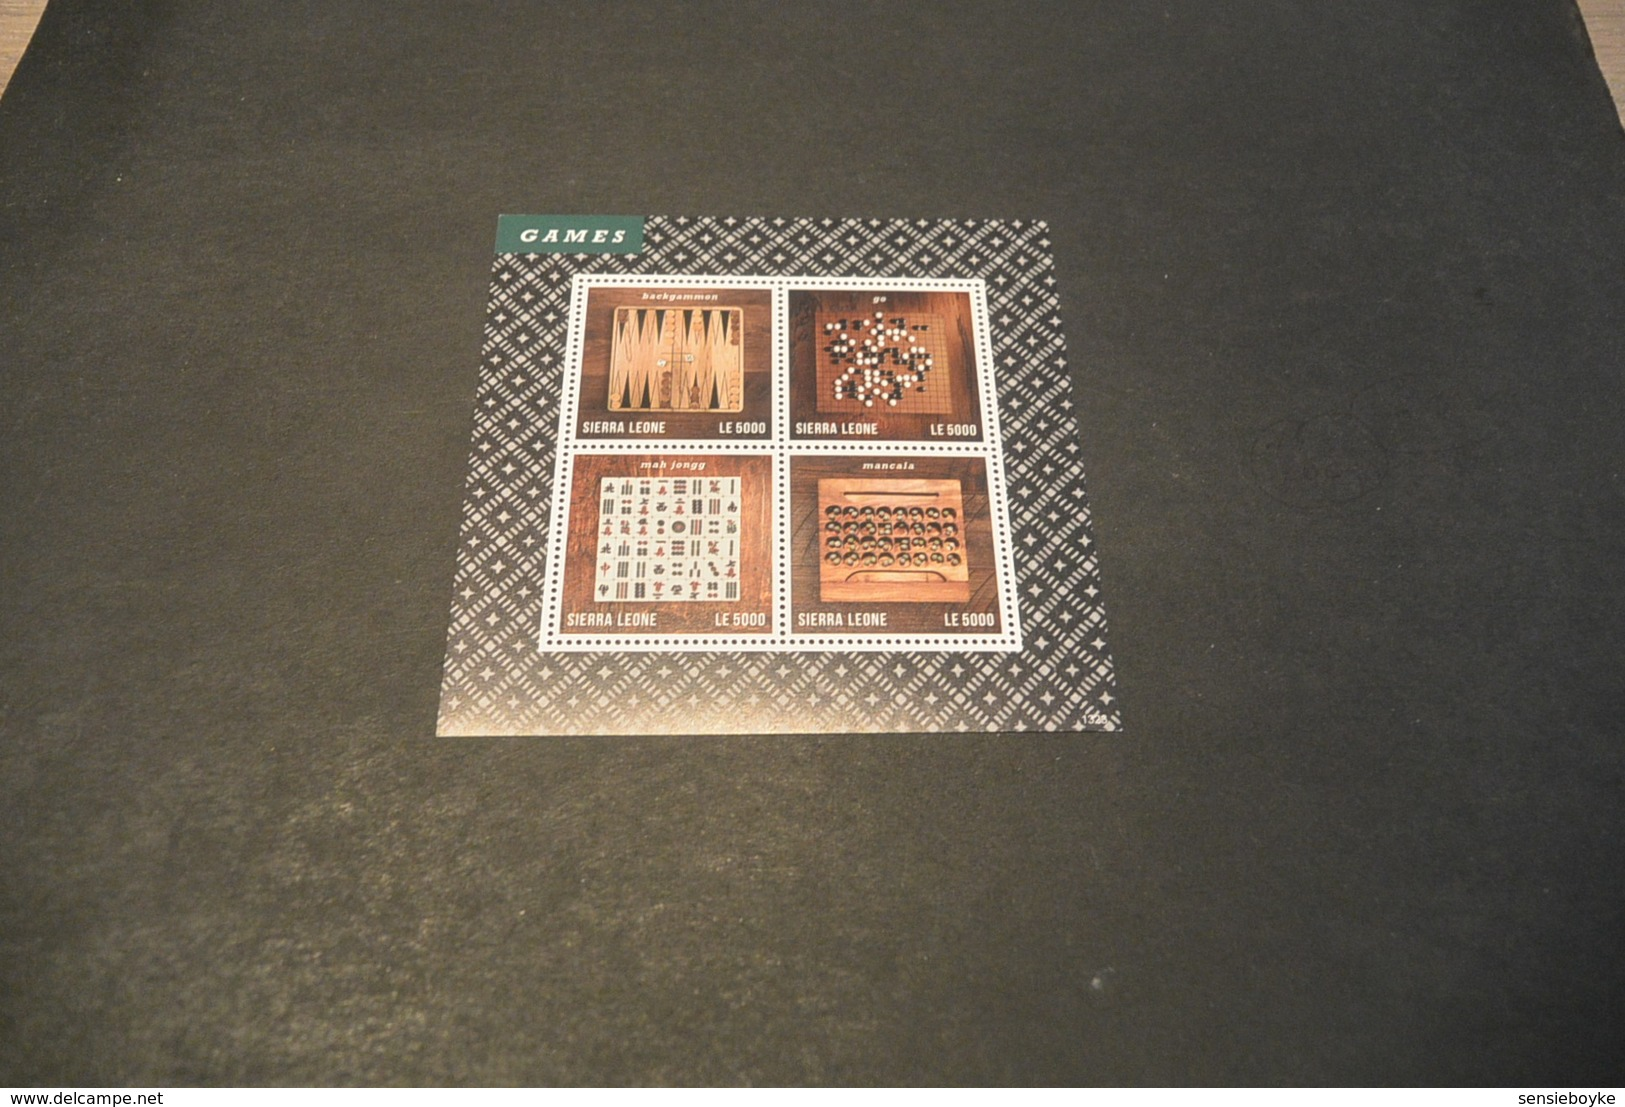 M4810 - Set In Blocs MNH Sierra Leone - 2013 Games - History Of Chess - Schaken